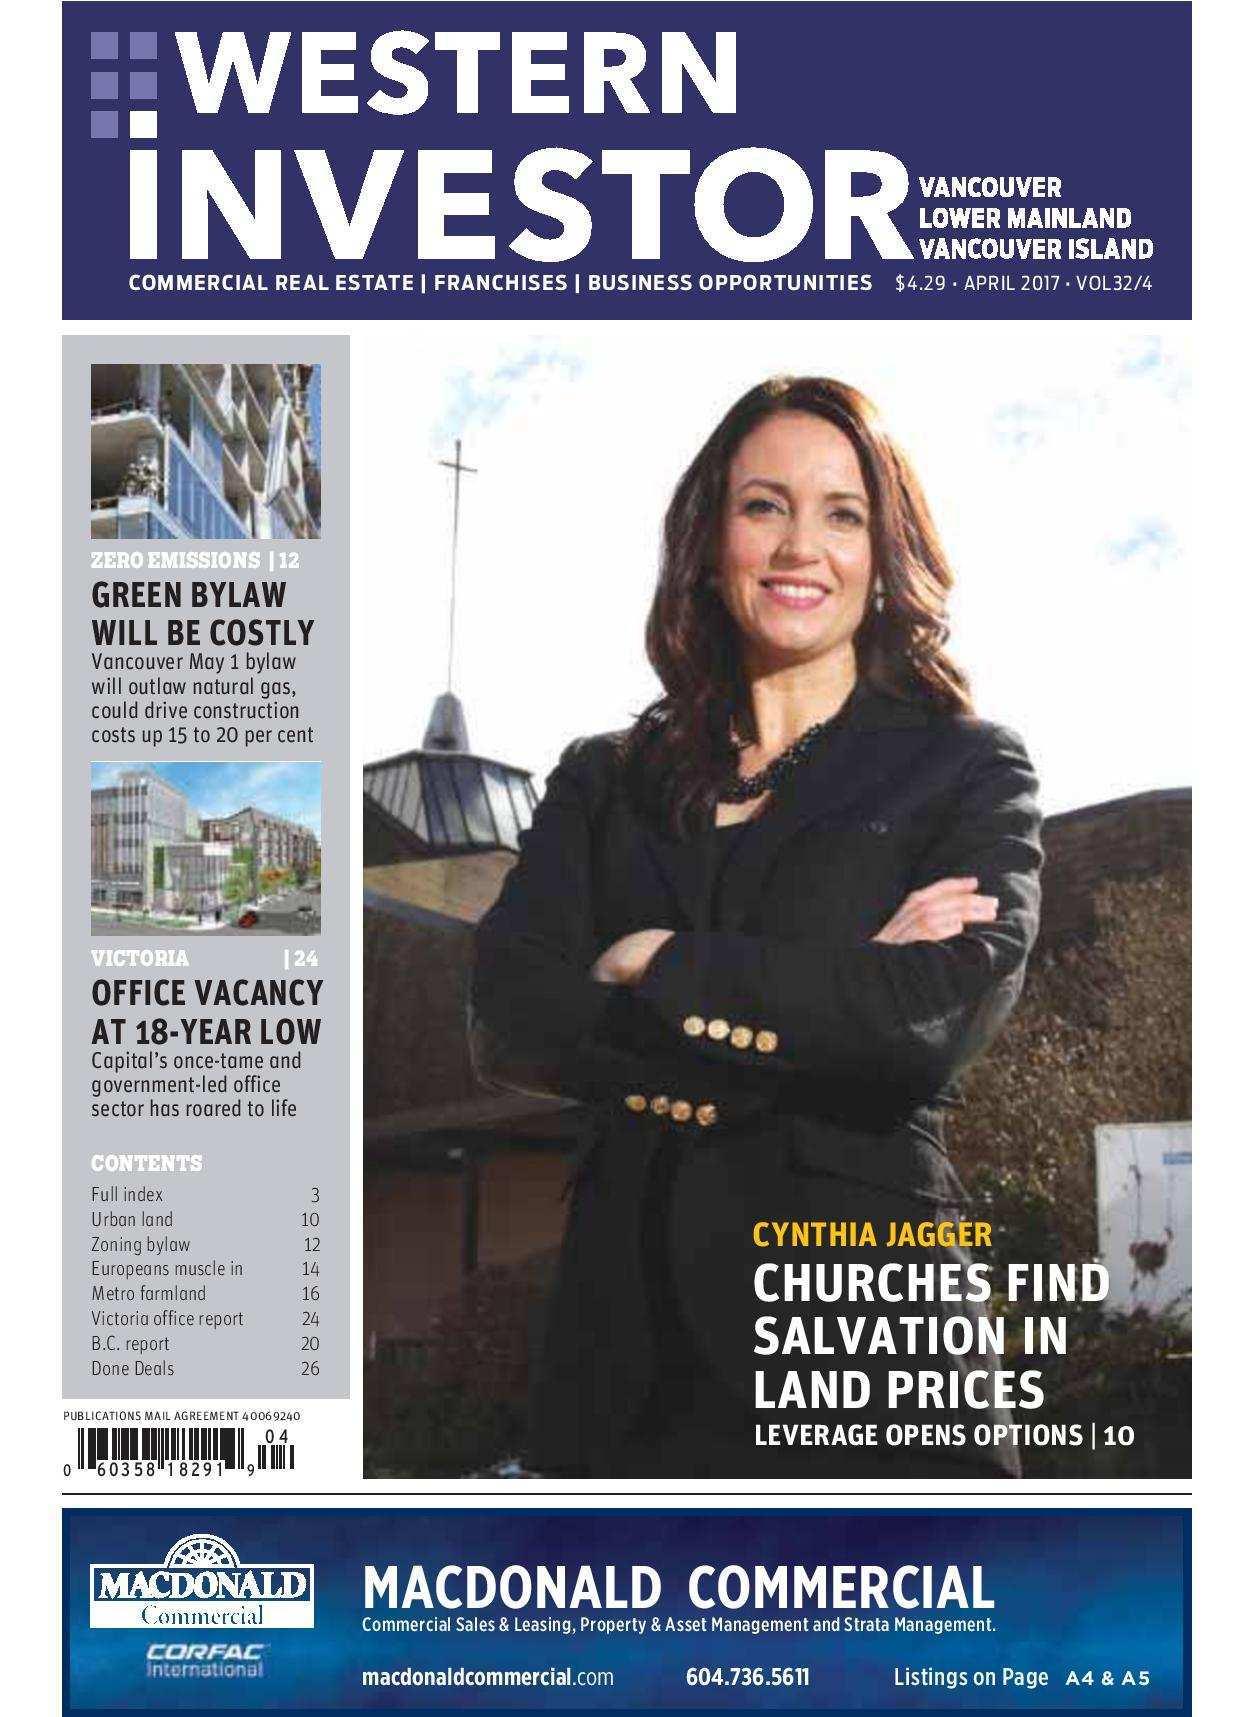 Press Release: Western Investor Ad – April 2017